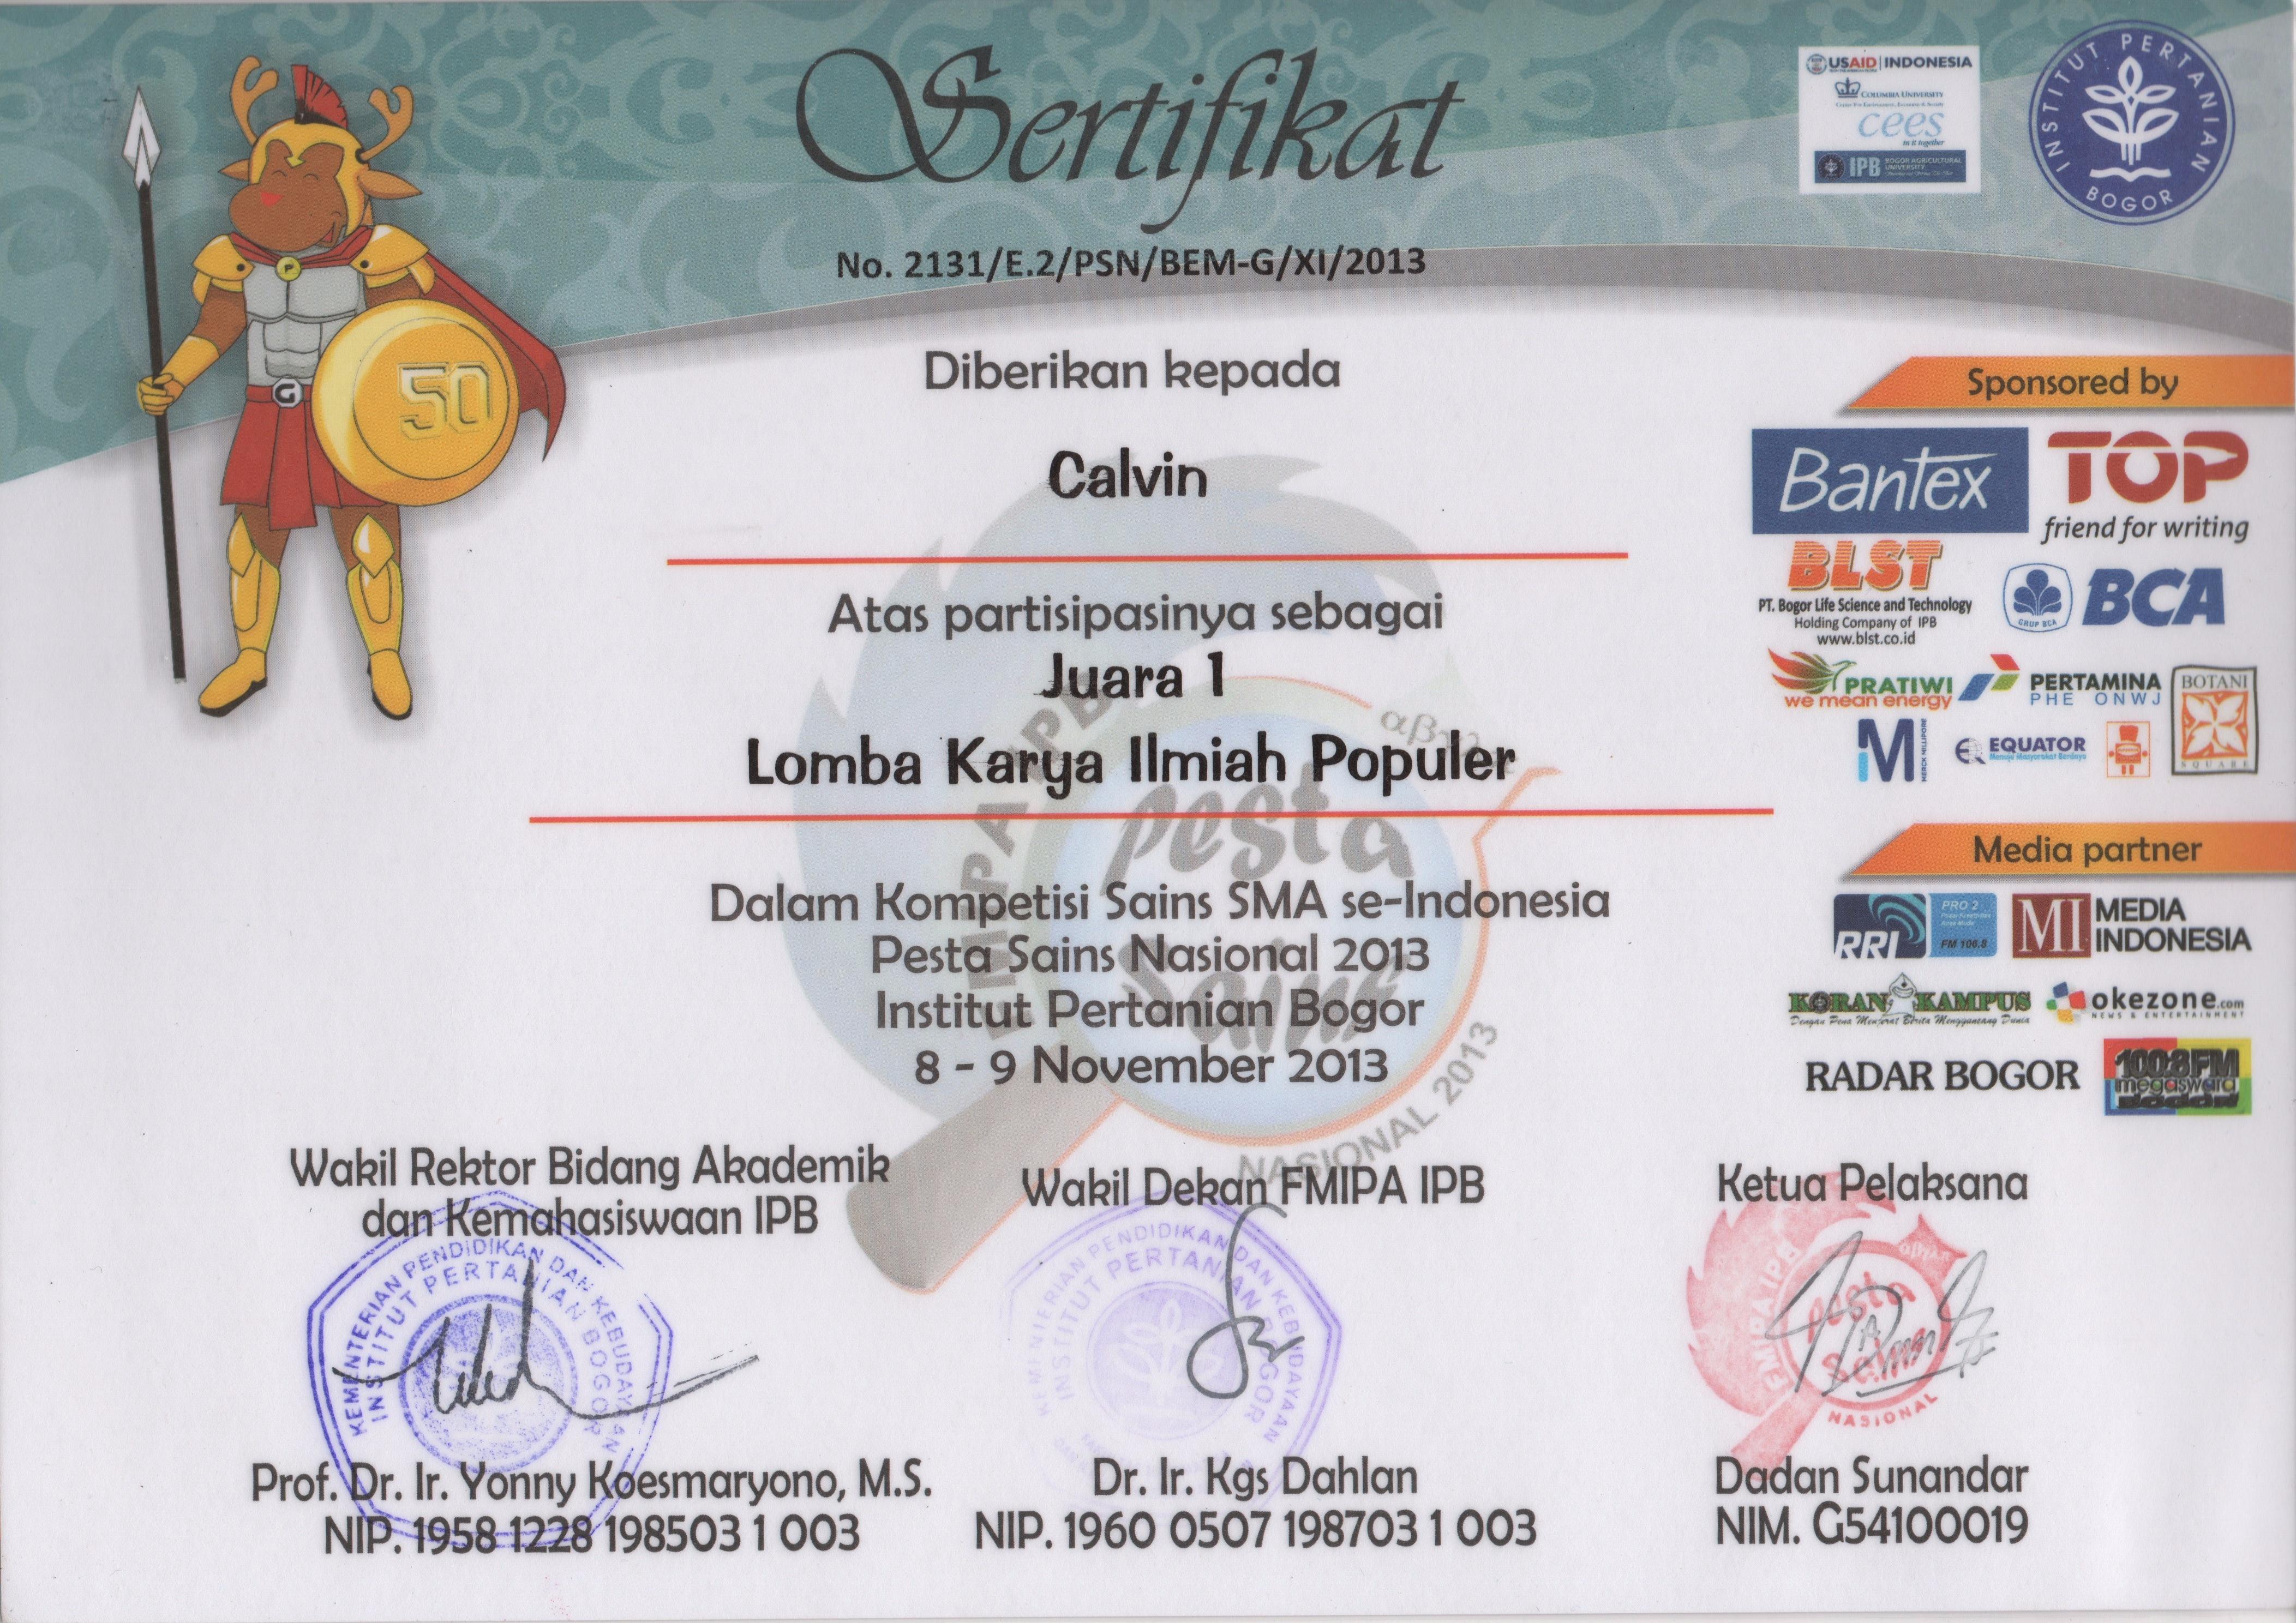 Sertifikat Juara 1 Lomba Karya Ilmiah Populer (LKIP), Pesta Sains Nasional (PSN) 2013 - Calvin Susanto.jpeg